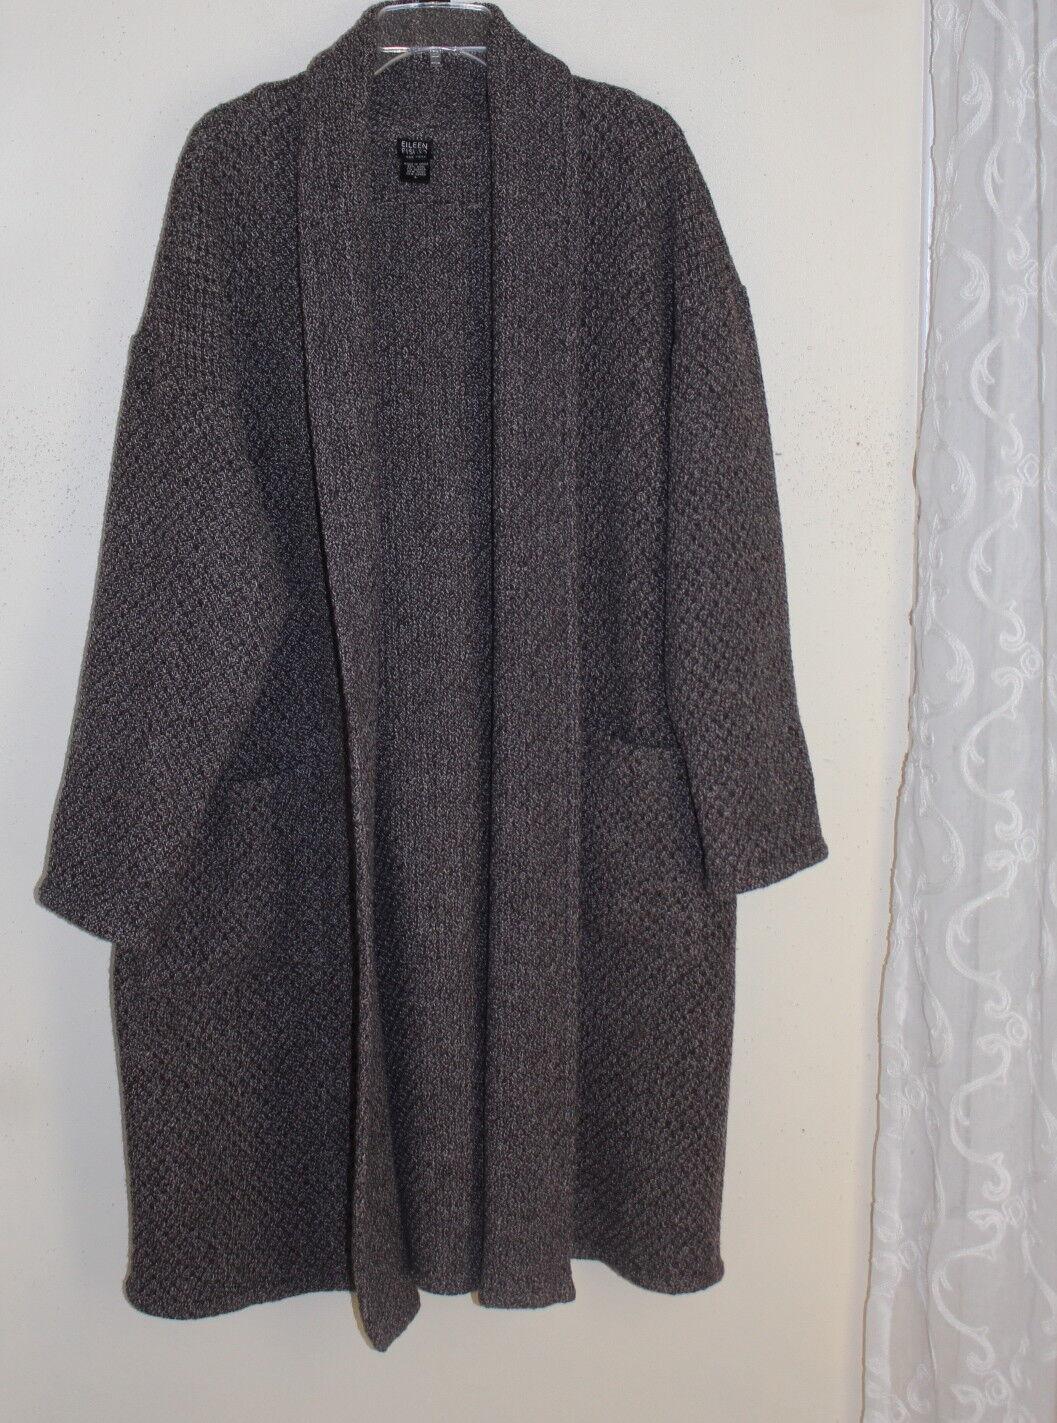 Elieen Fisher Talla  L LUXURY Rica Lana De Alpaca Tejido Largo Suéter Capa de la textura abierta  moda